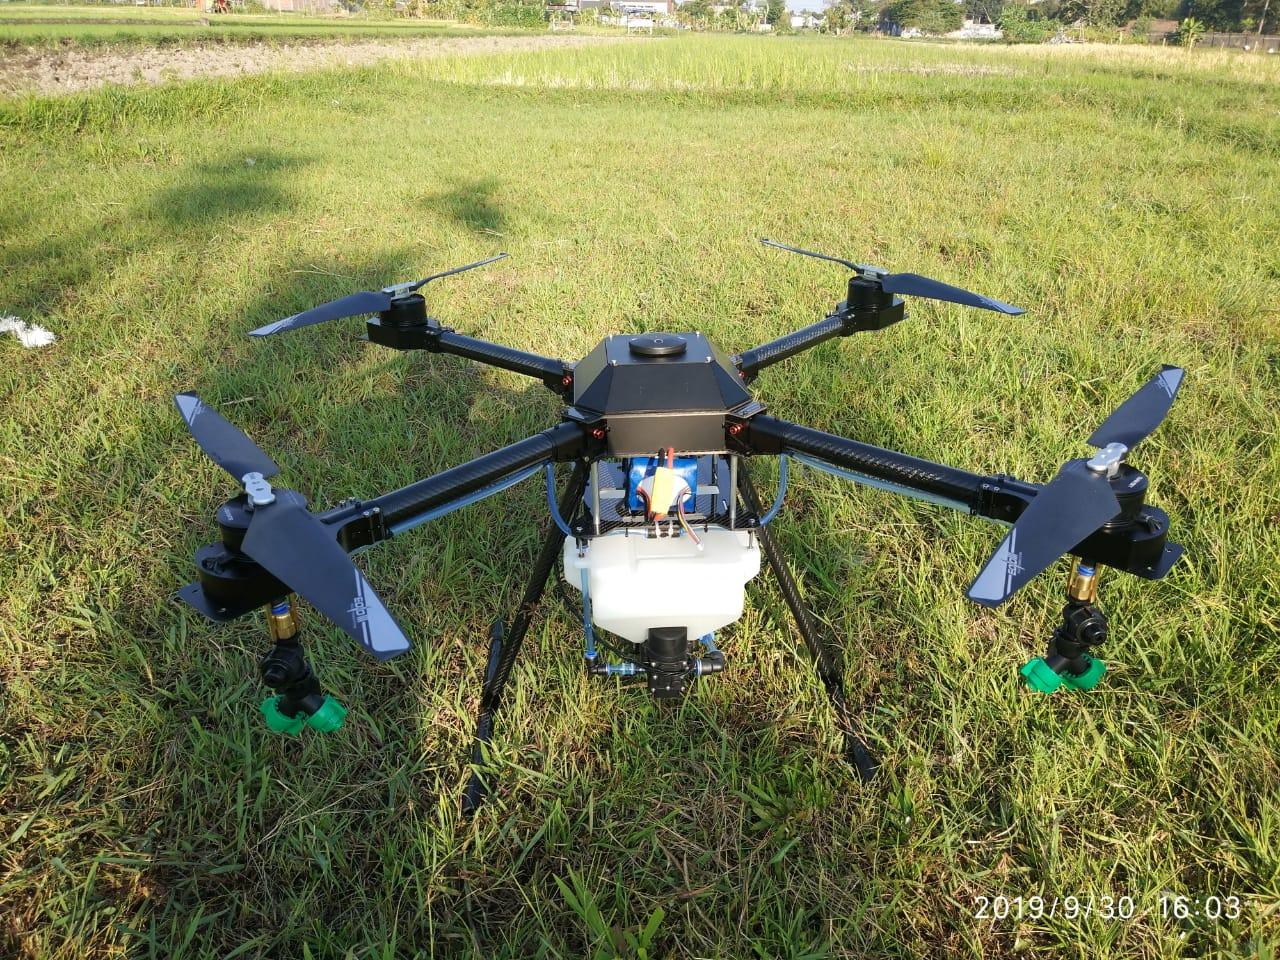 Drone Pertanian Ferto 15 FDS (sumber : Fulldronesolutions.com)